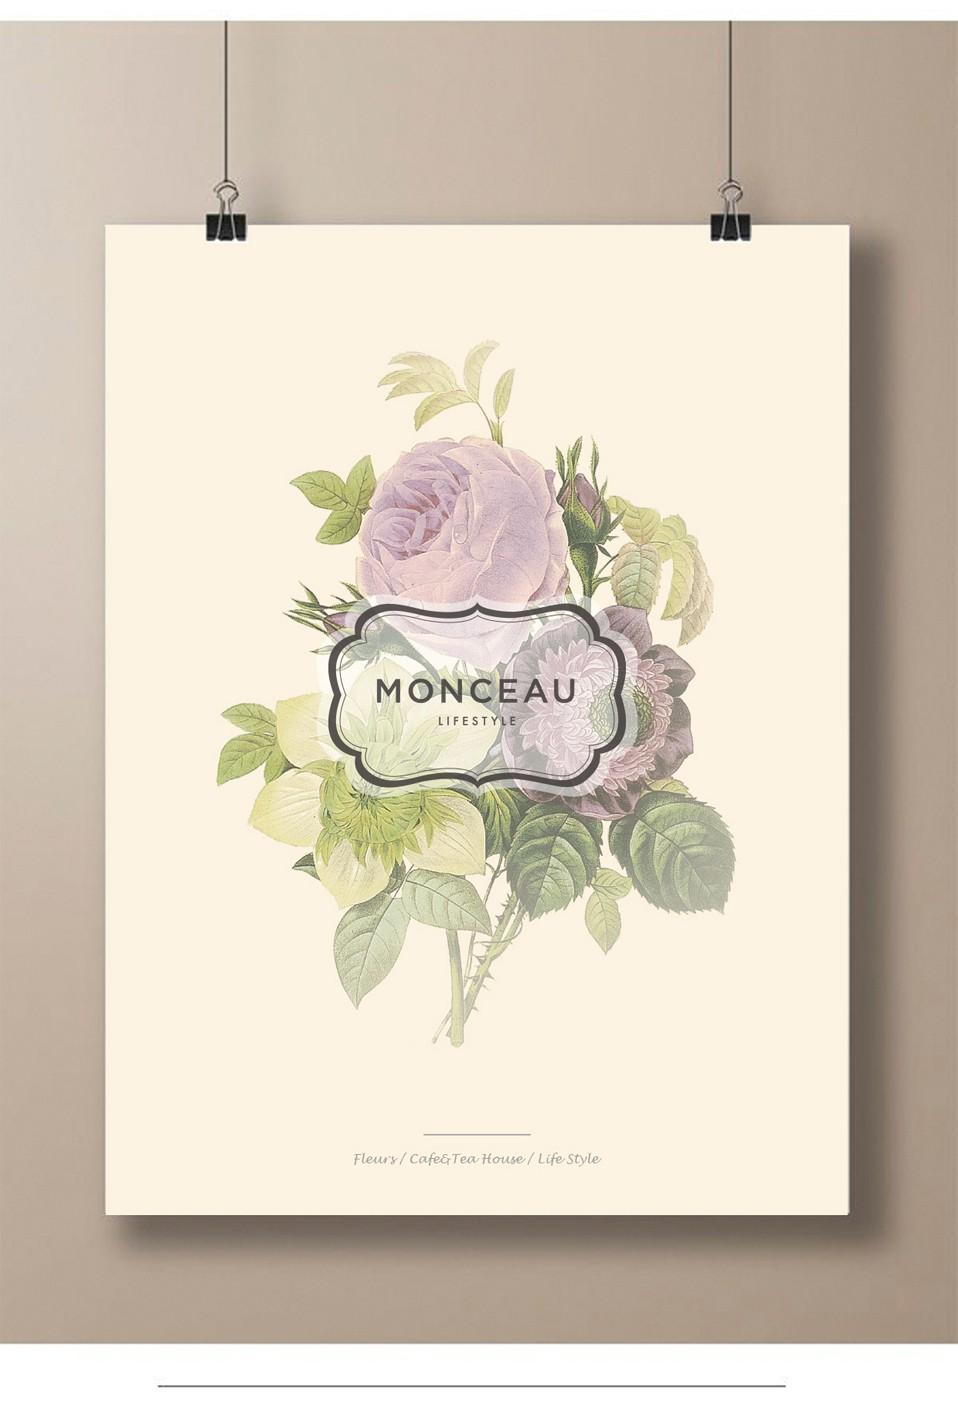 monceau-vi基础vi设计cis设计品牌形象设计_03